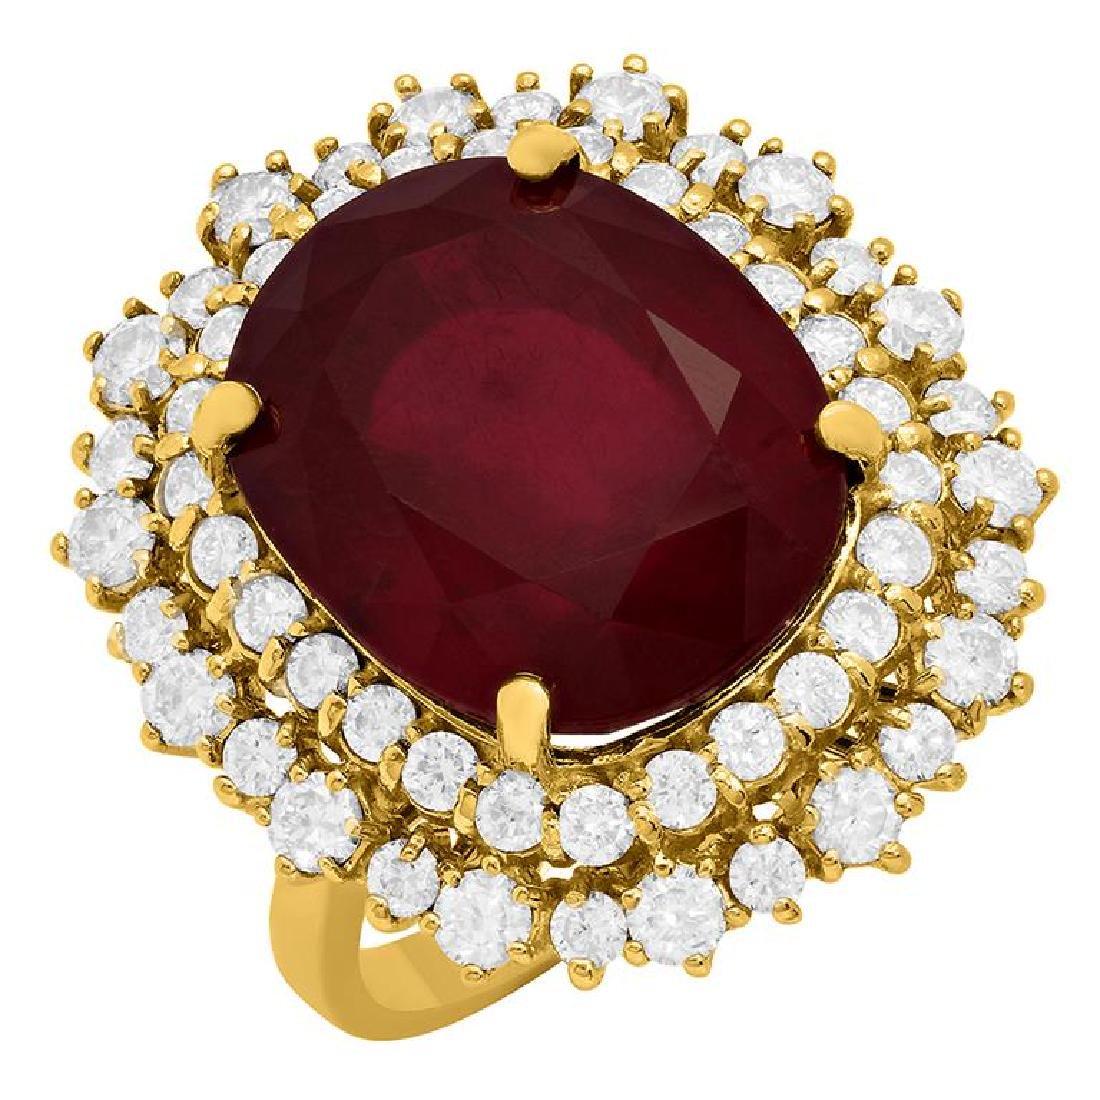 14k Yellow Gold 17.15ct Ruby 2.13ct Diamond Ring